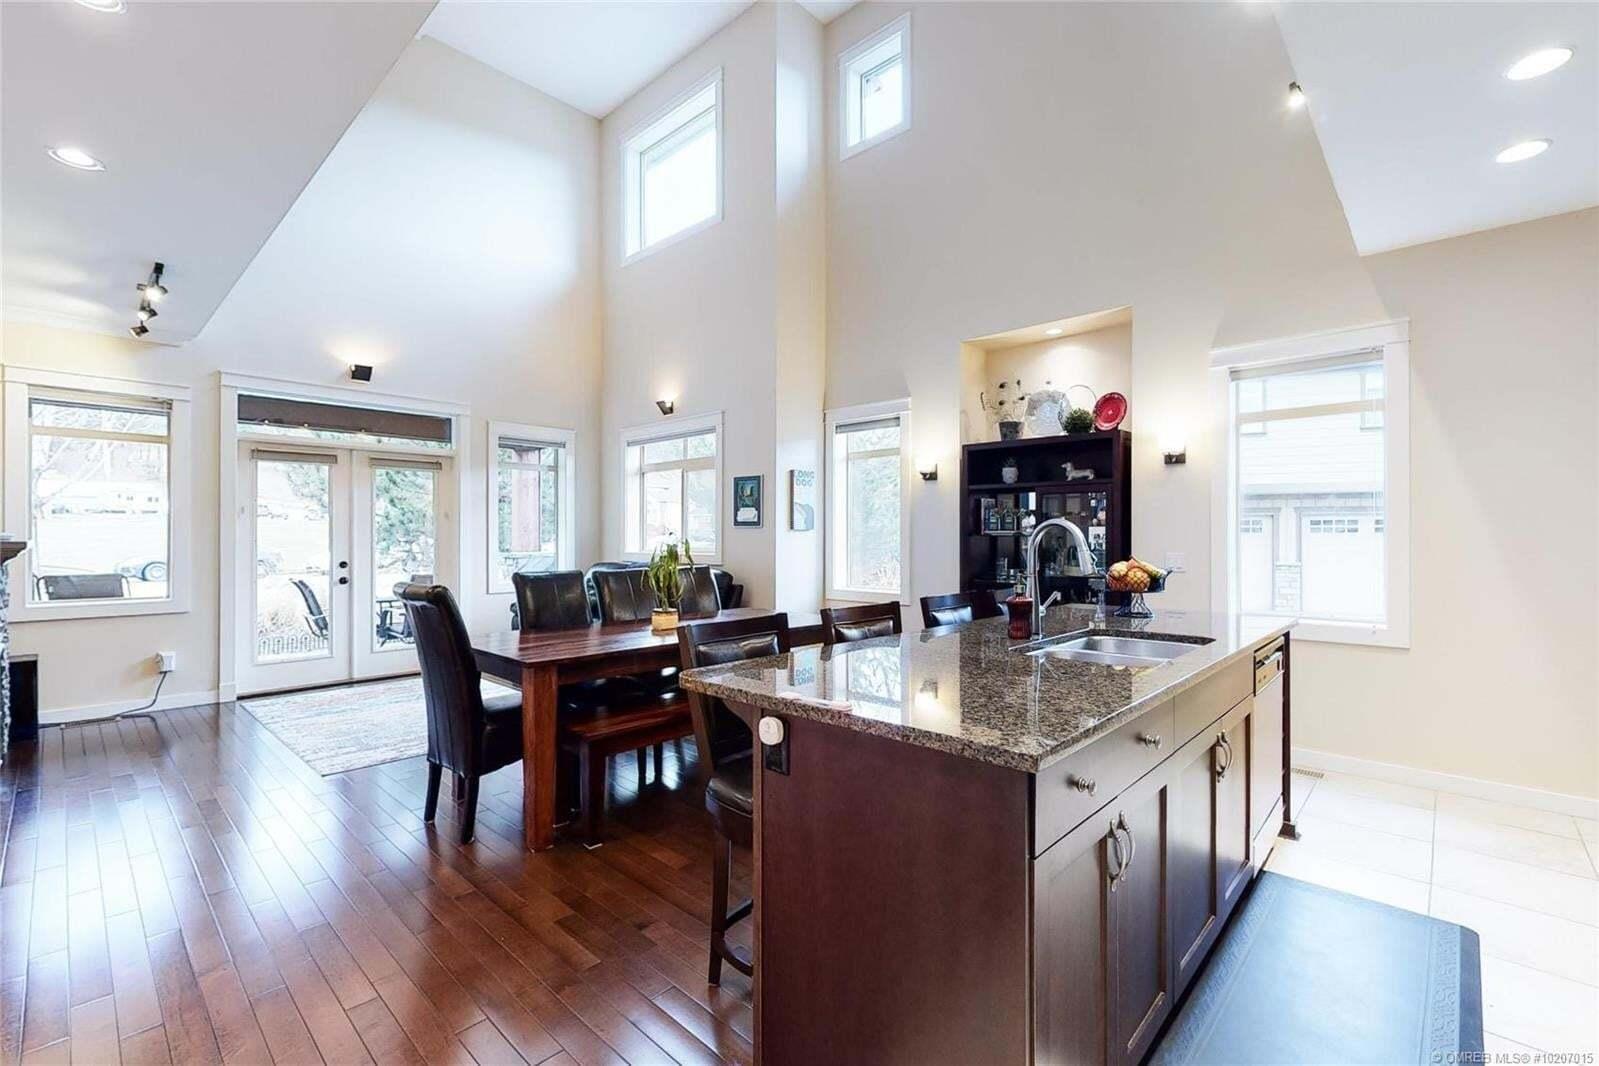 Townhouse for sale at 511 Yates Rd Kelowna British Columbia - MLS: 10207015